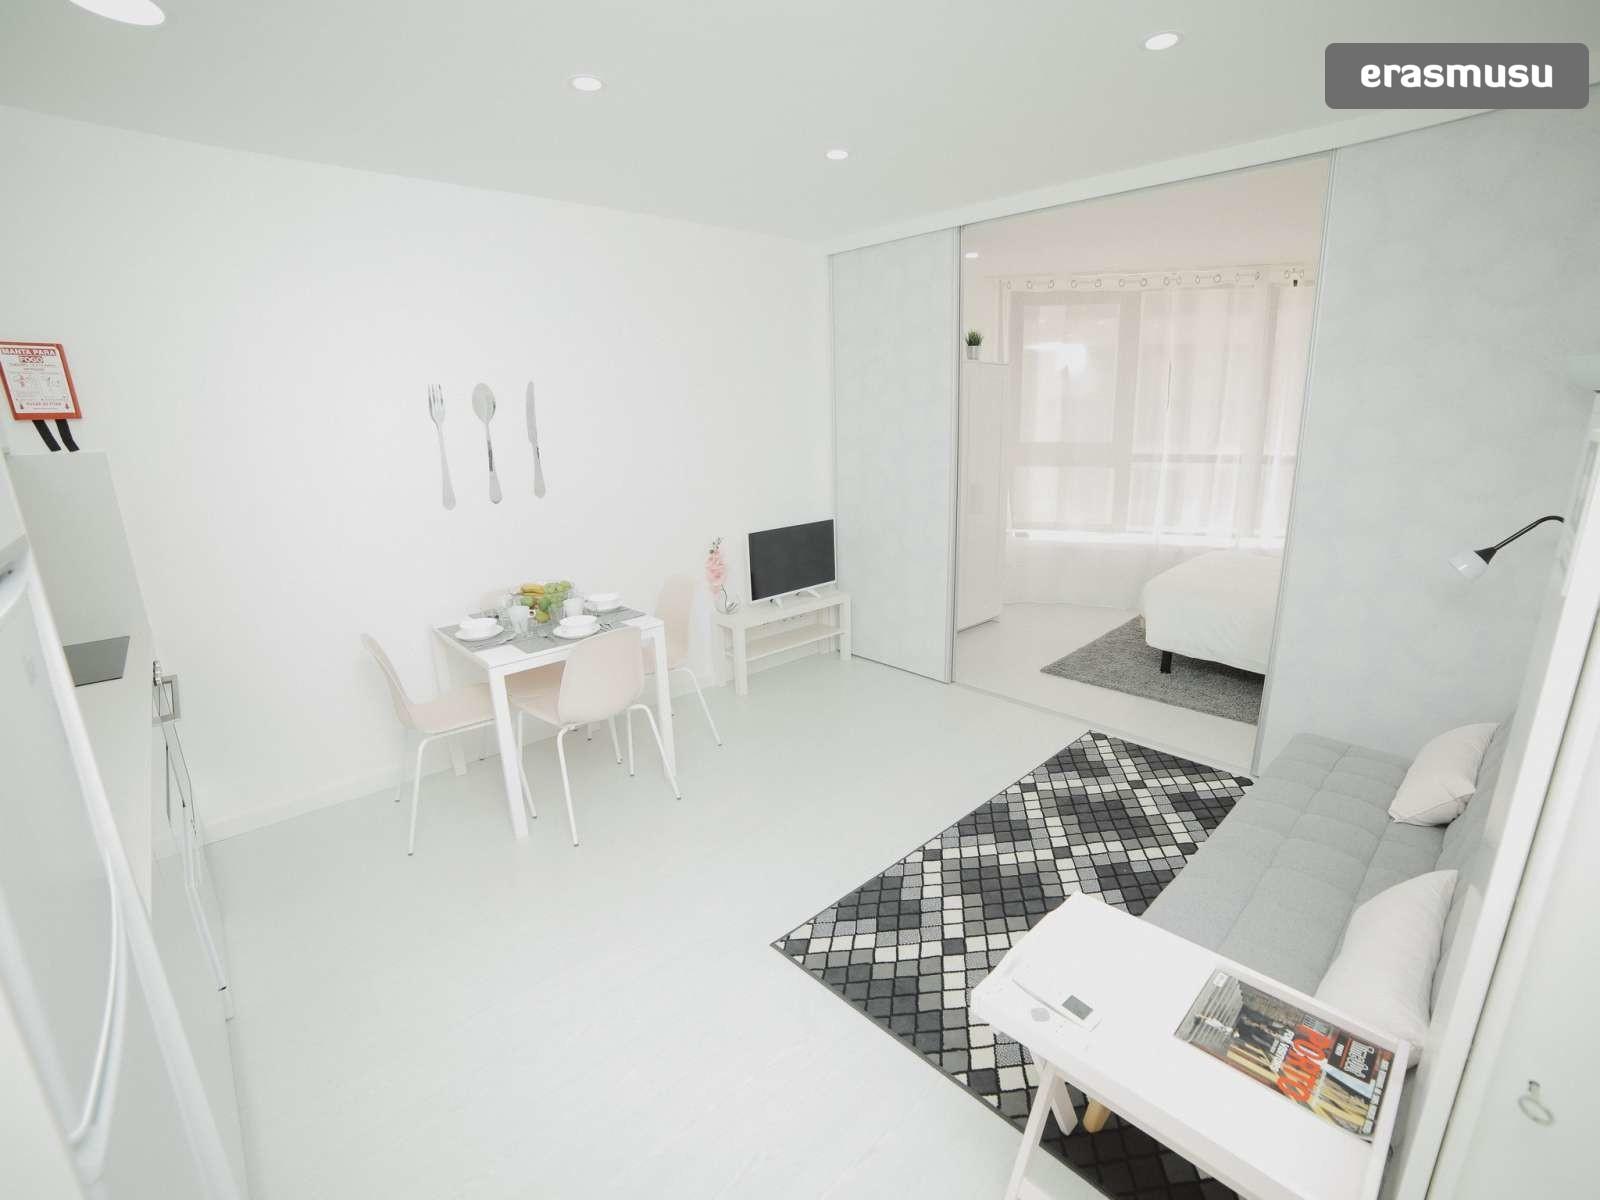 bright-studio-rent-santo-ildefonso-porto-d064b70430047130010ca34